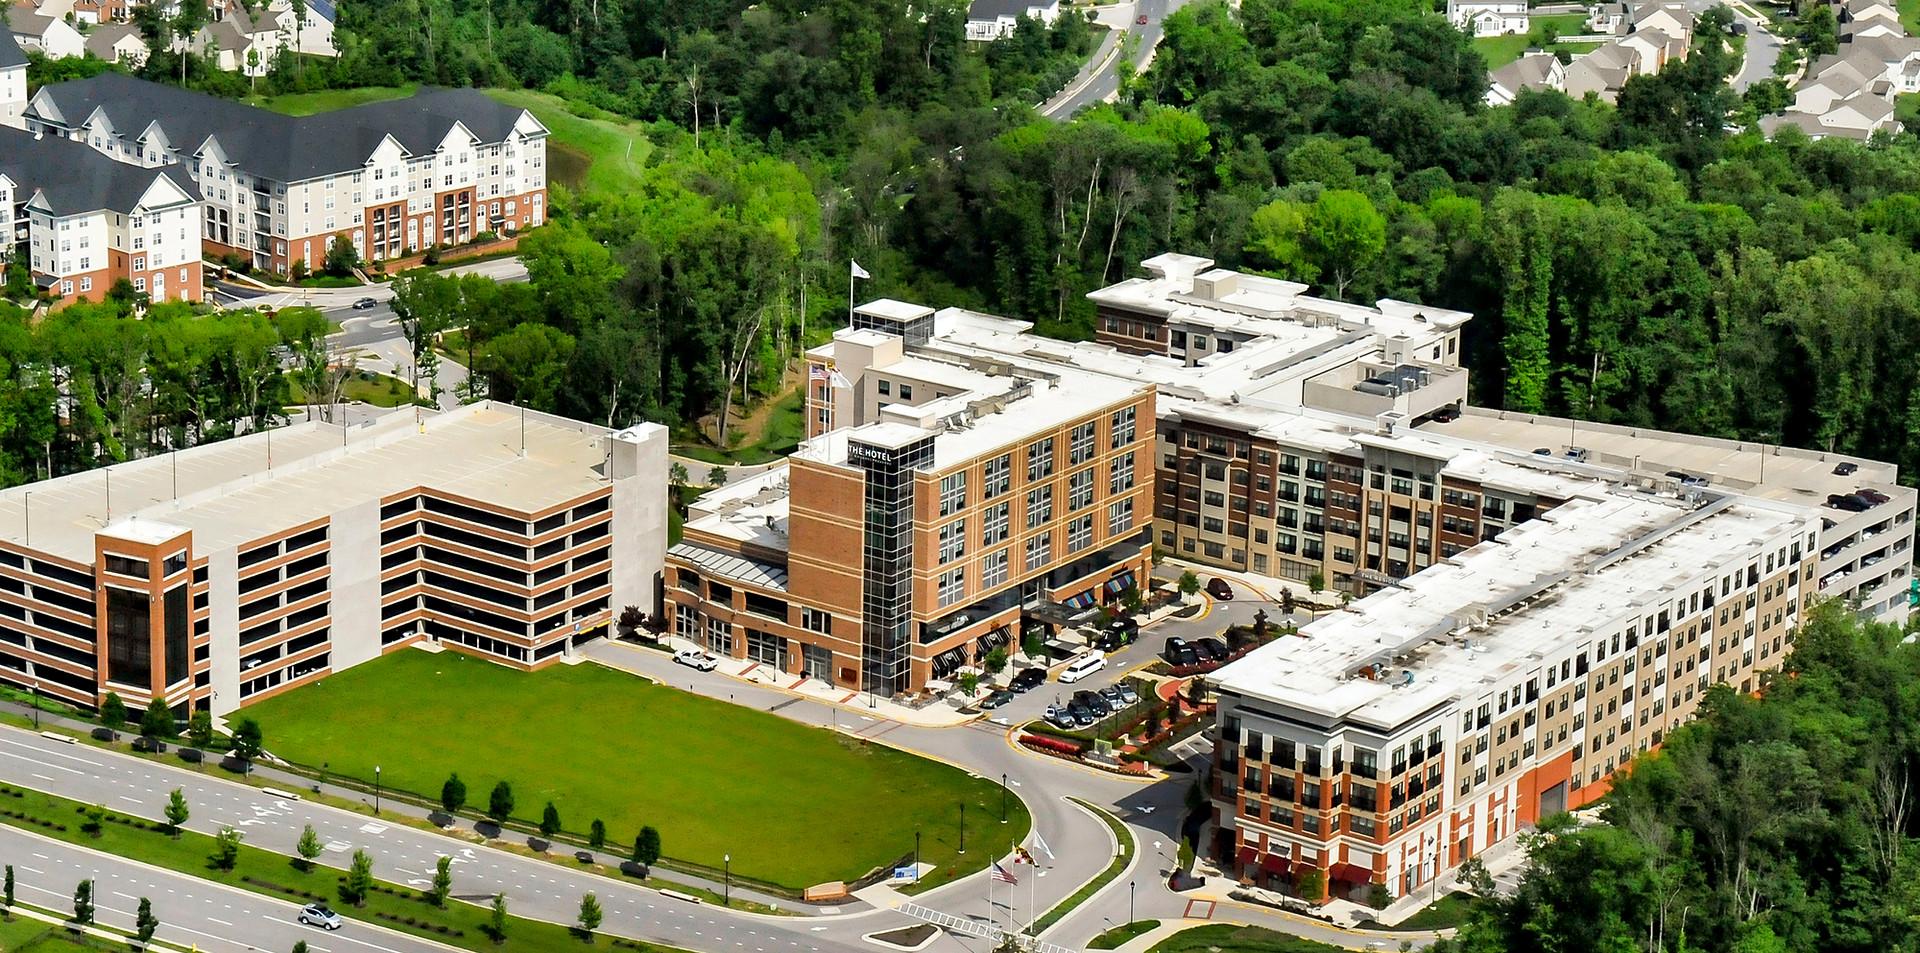 Southern_Management_•_Hotel_Arundel_Mills.jpg